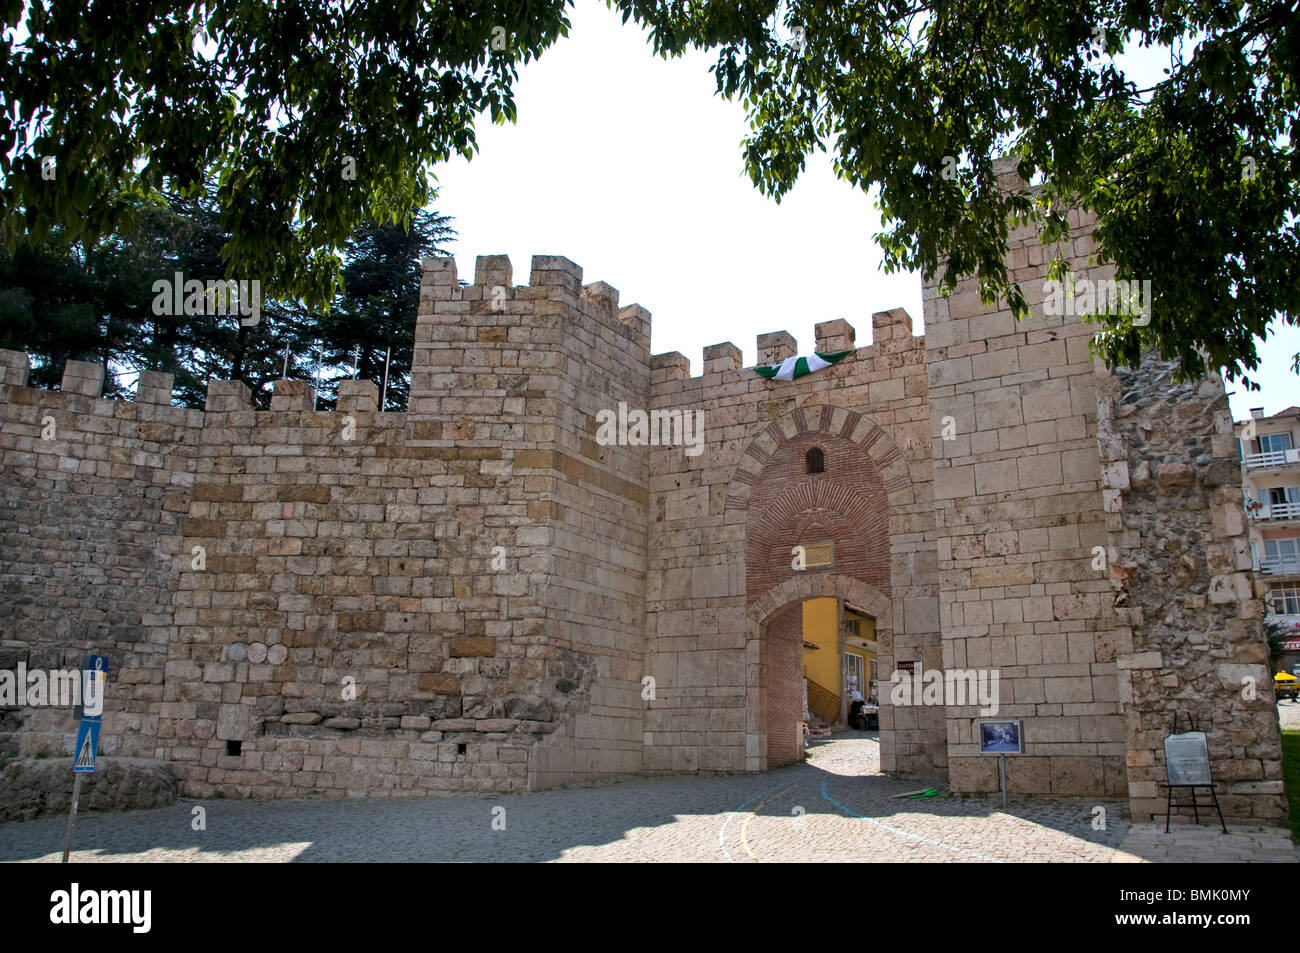 Bursa Turkey Anatolia Gate of the Rule City wall - Stock Image